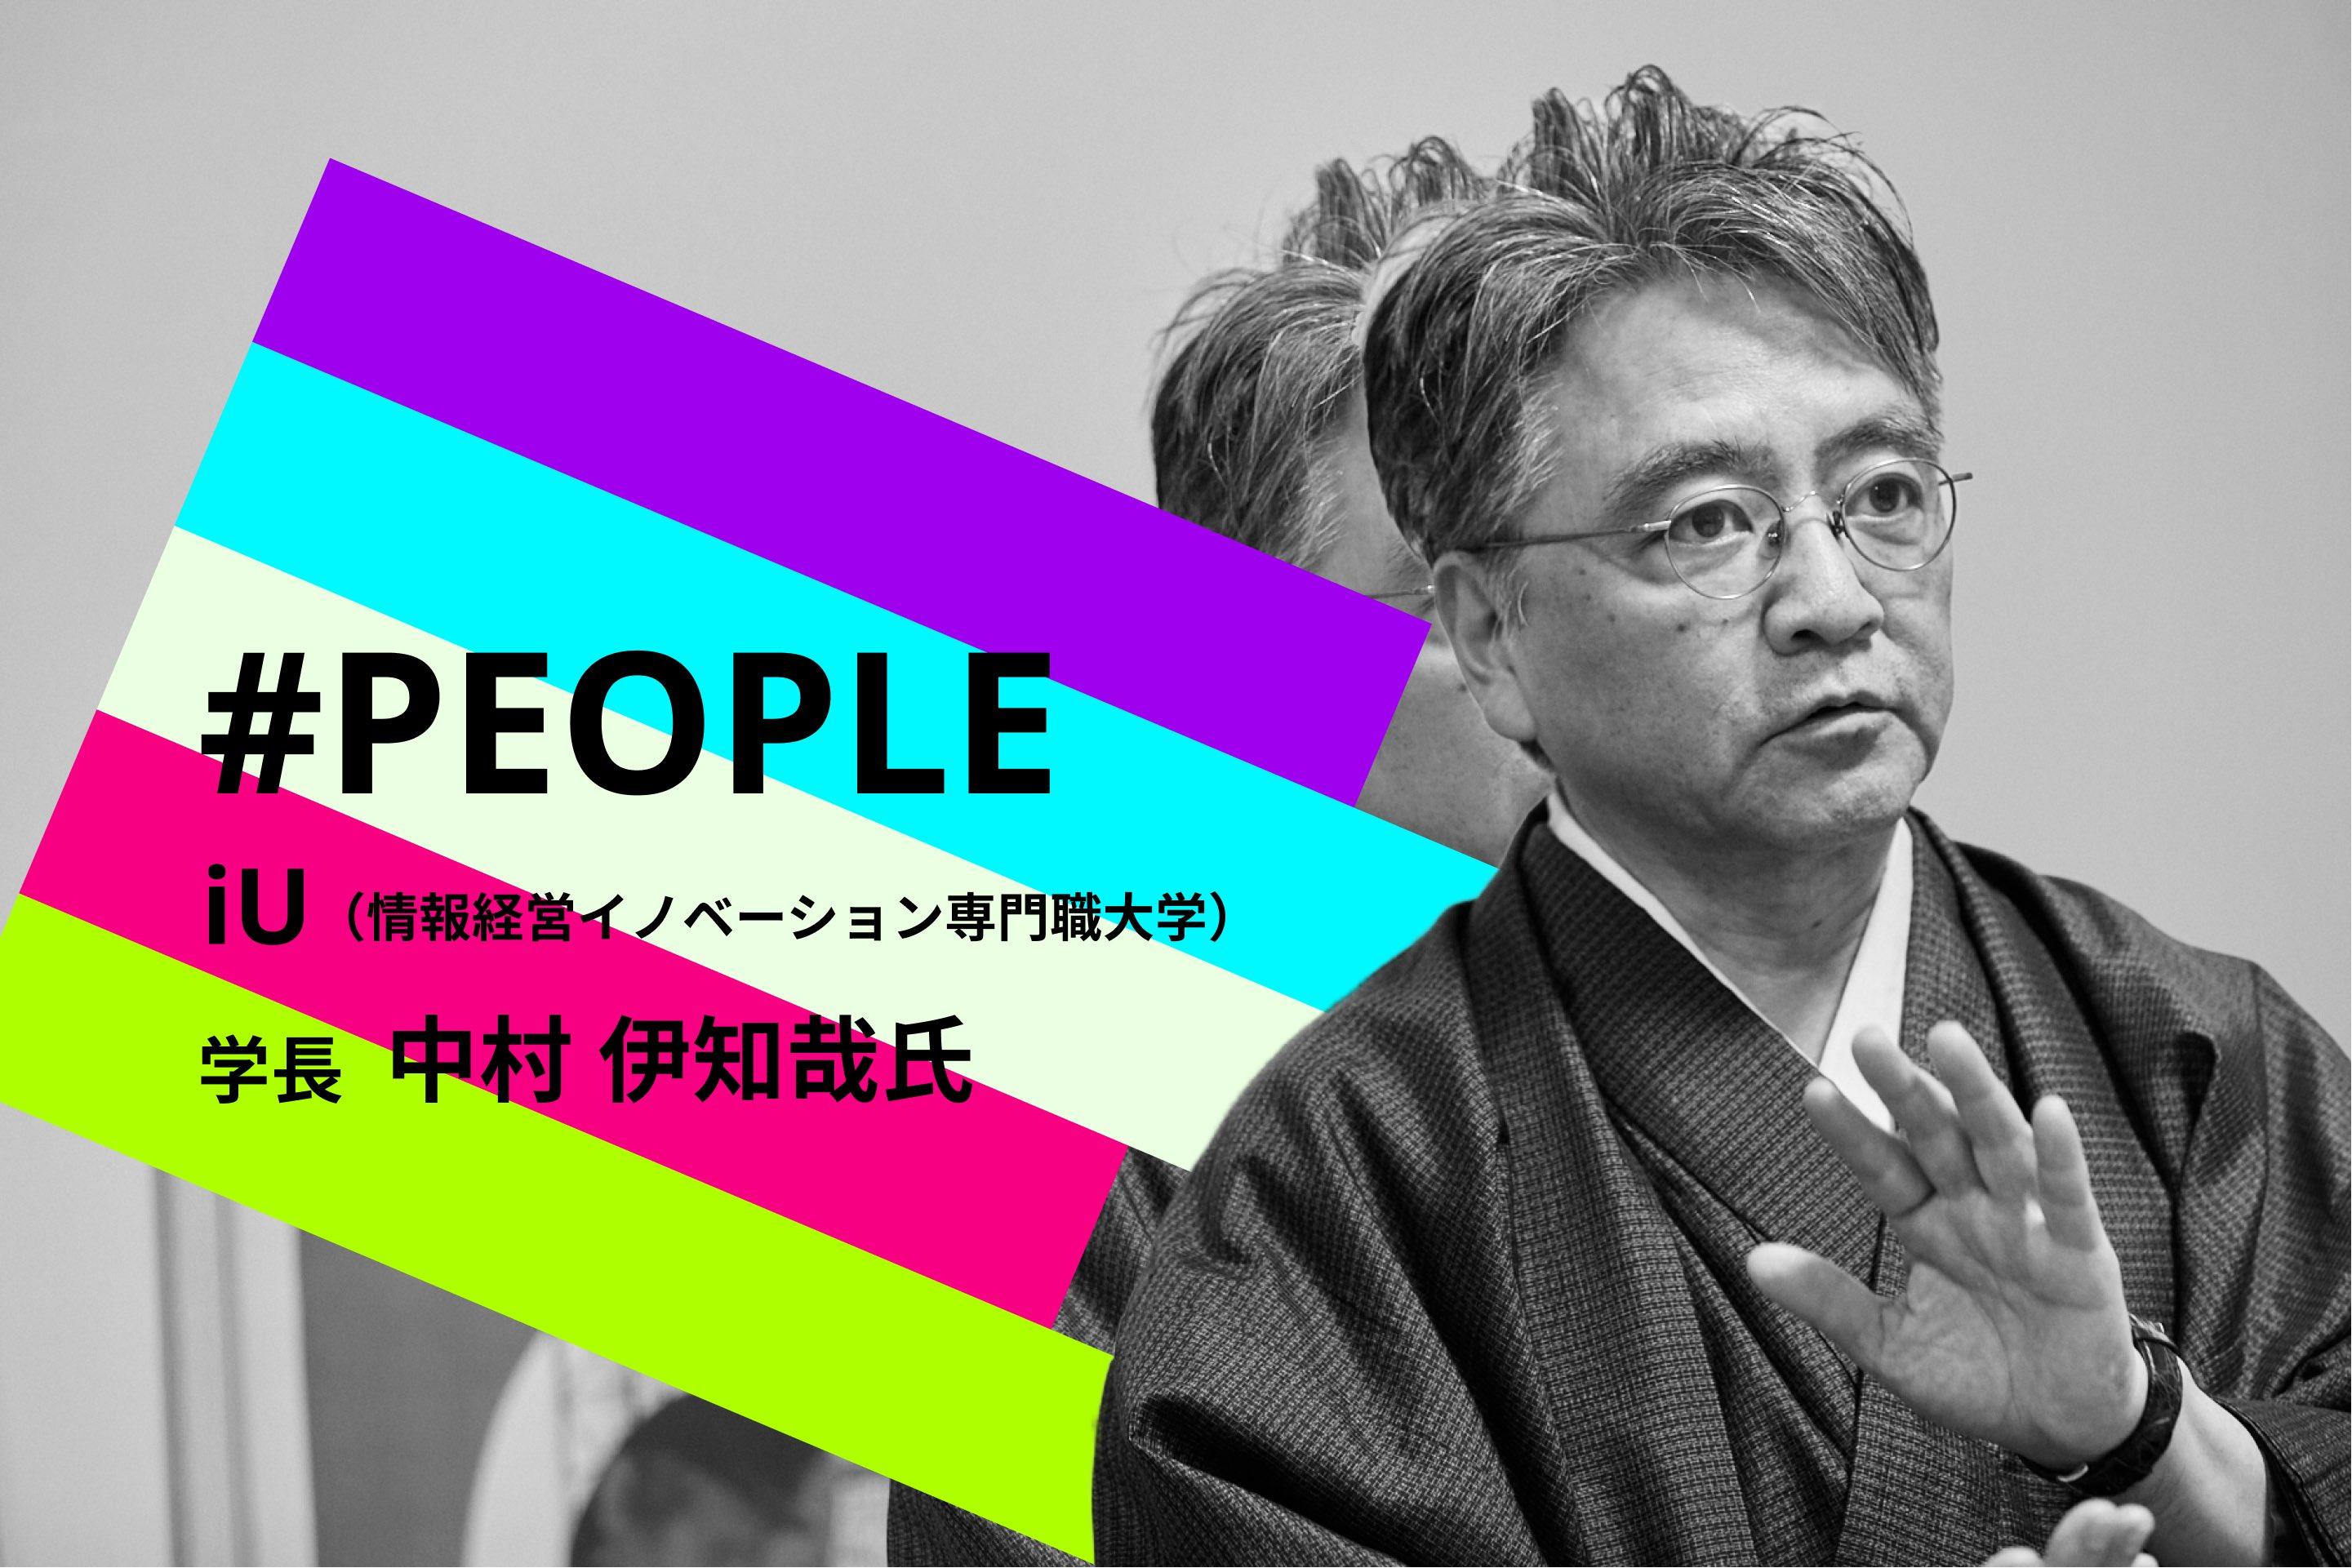 #PEOPLE | iU学長・中村伊知哉氏が語る「リアルな共創プラットフォーム」としての大学を作った理由